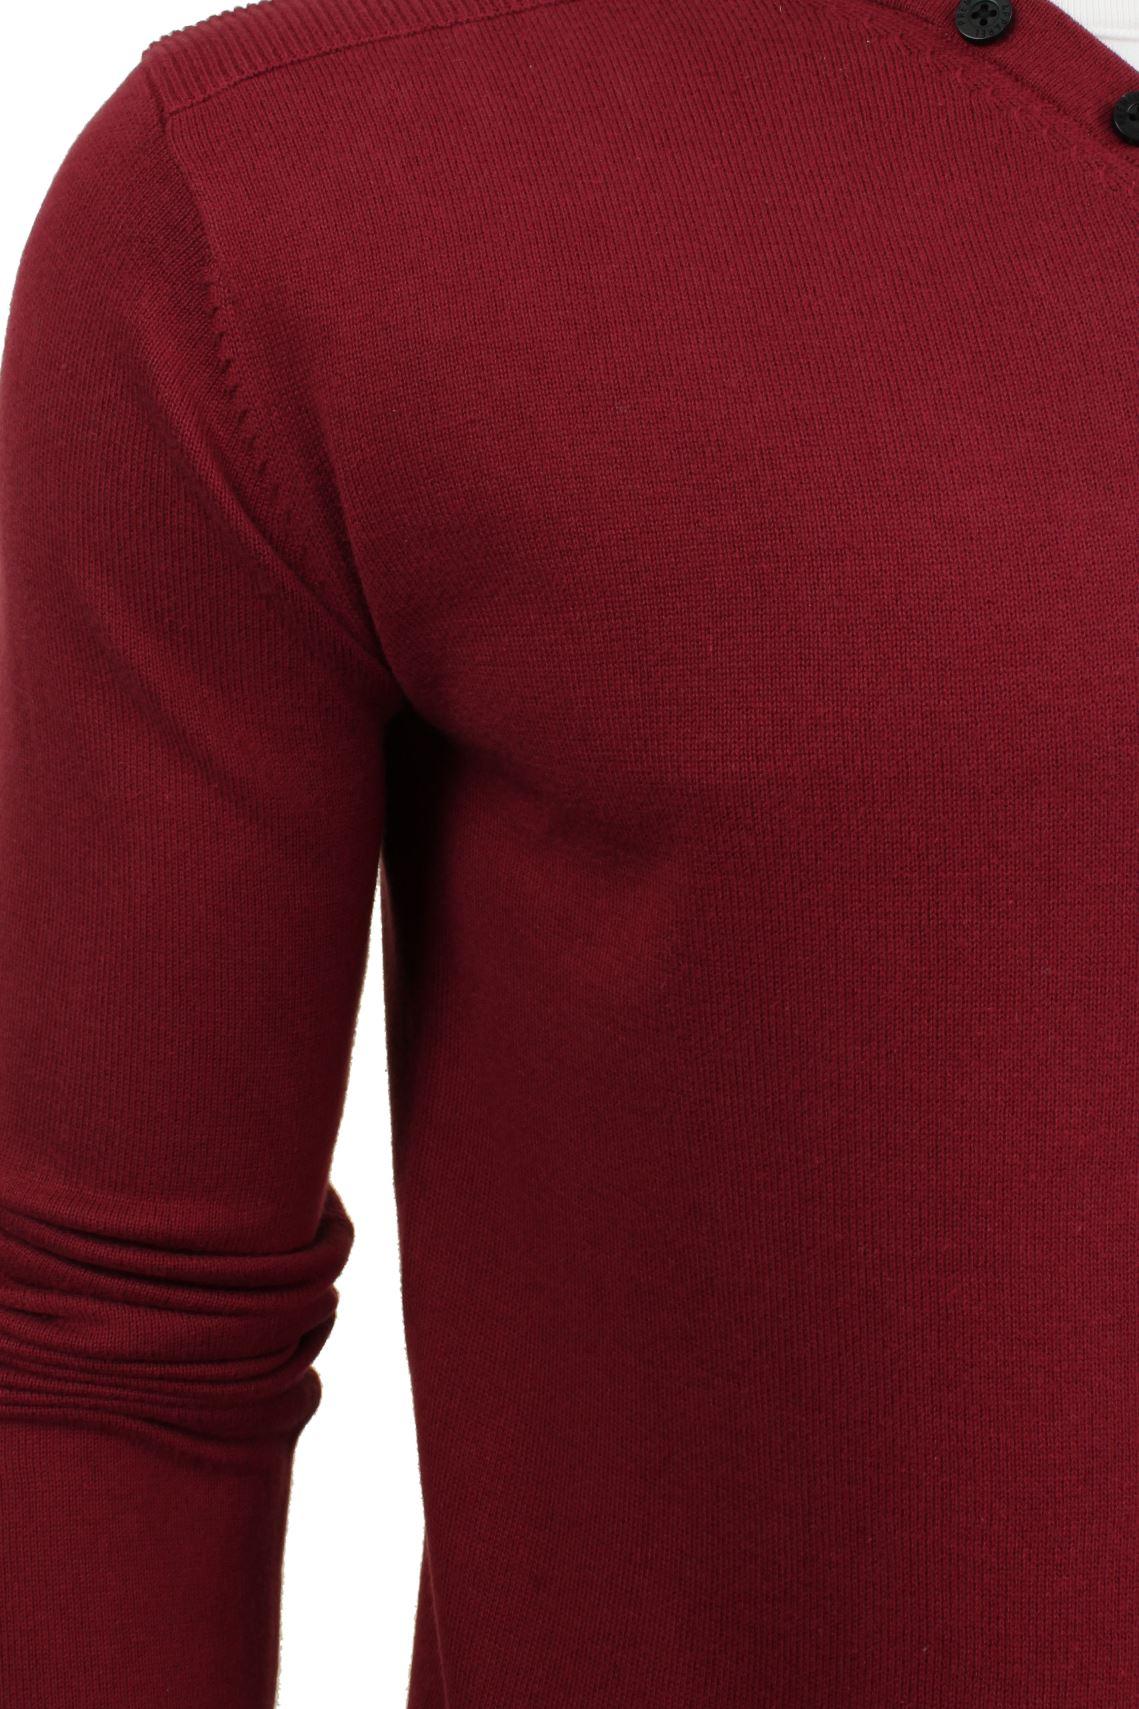 Mens Jumper Cotton fashion sweater by Smith /& Jones